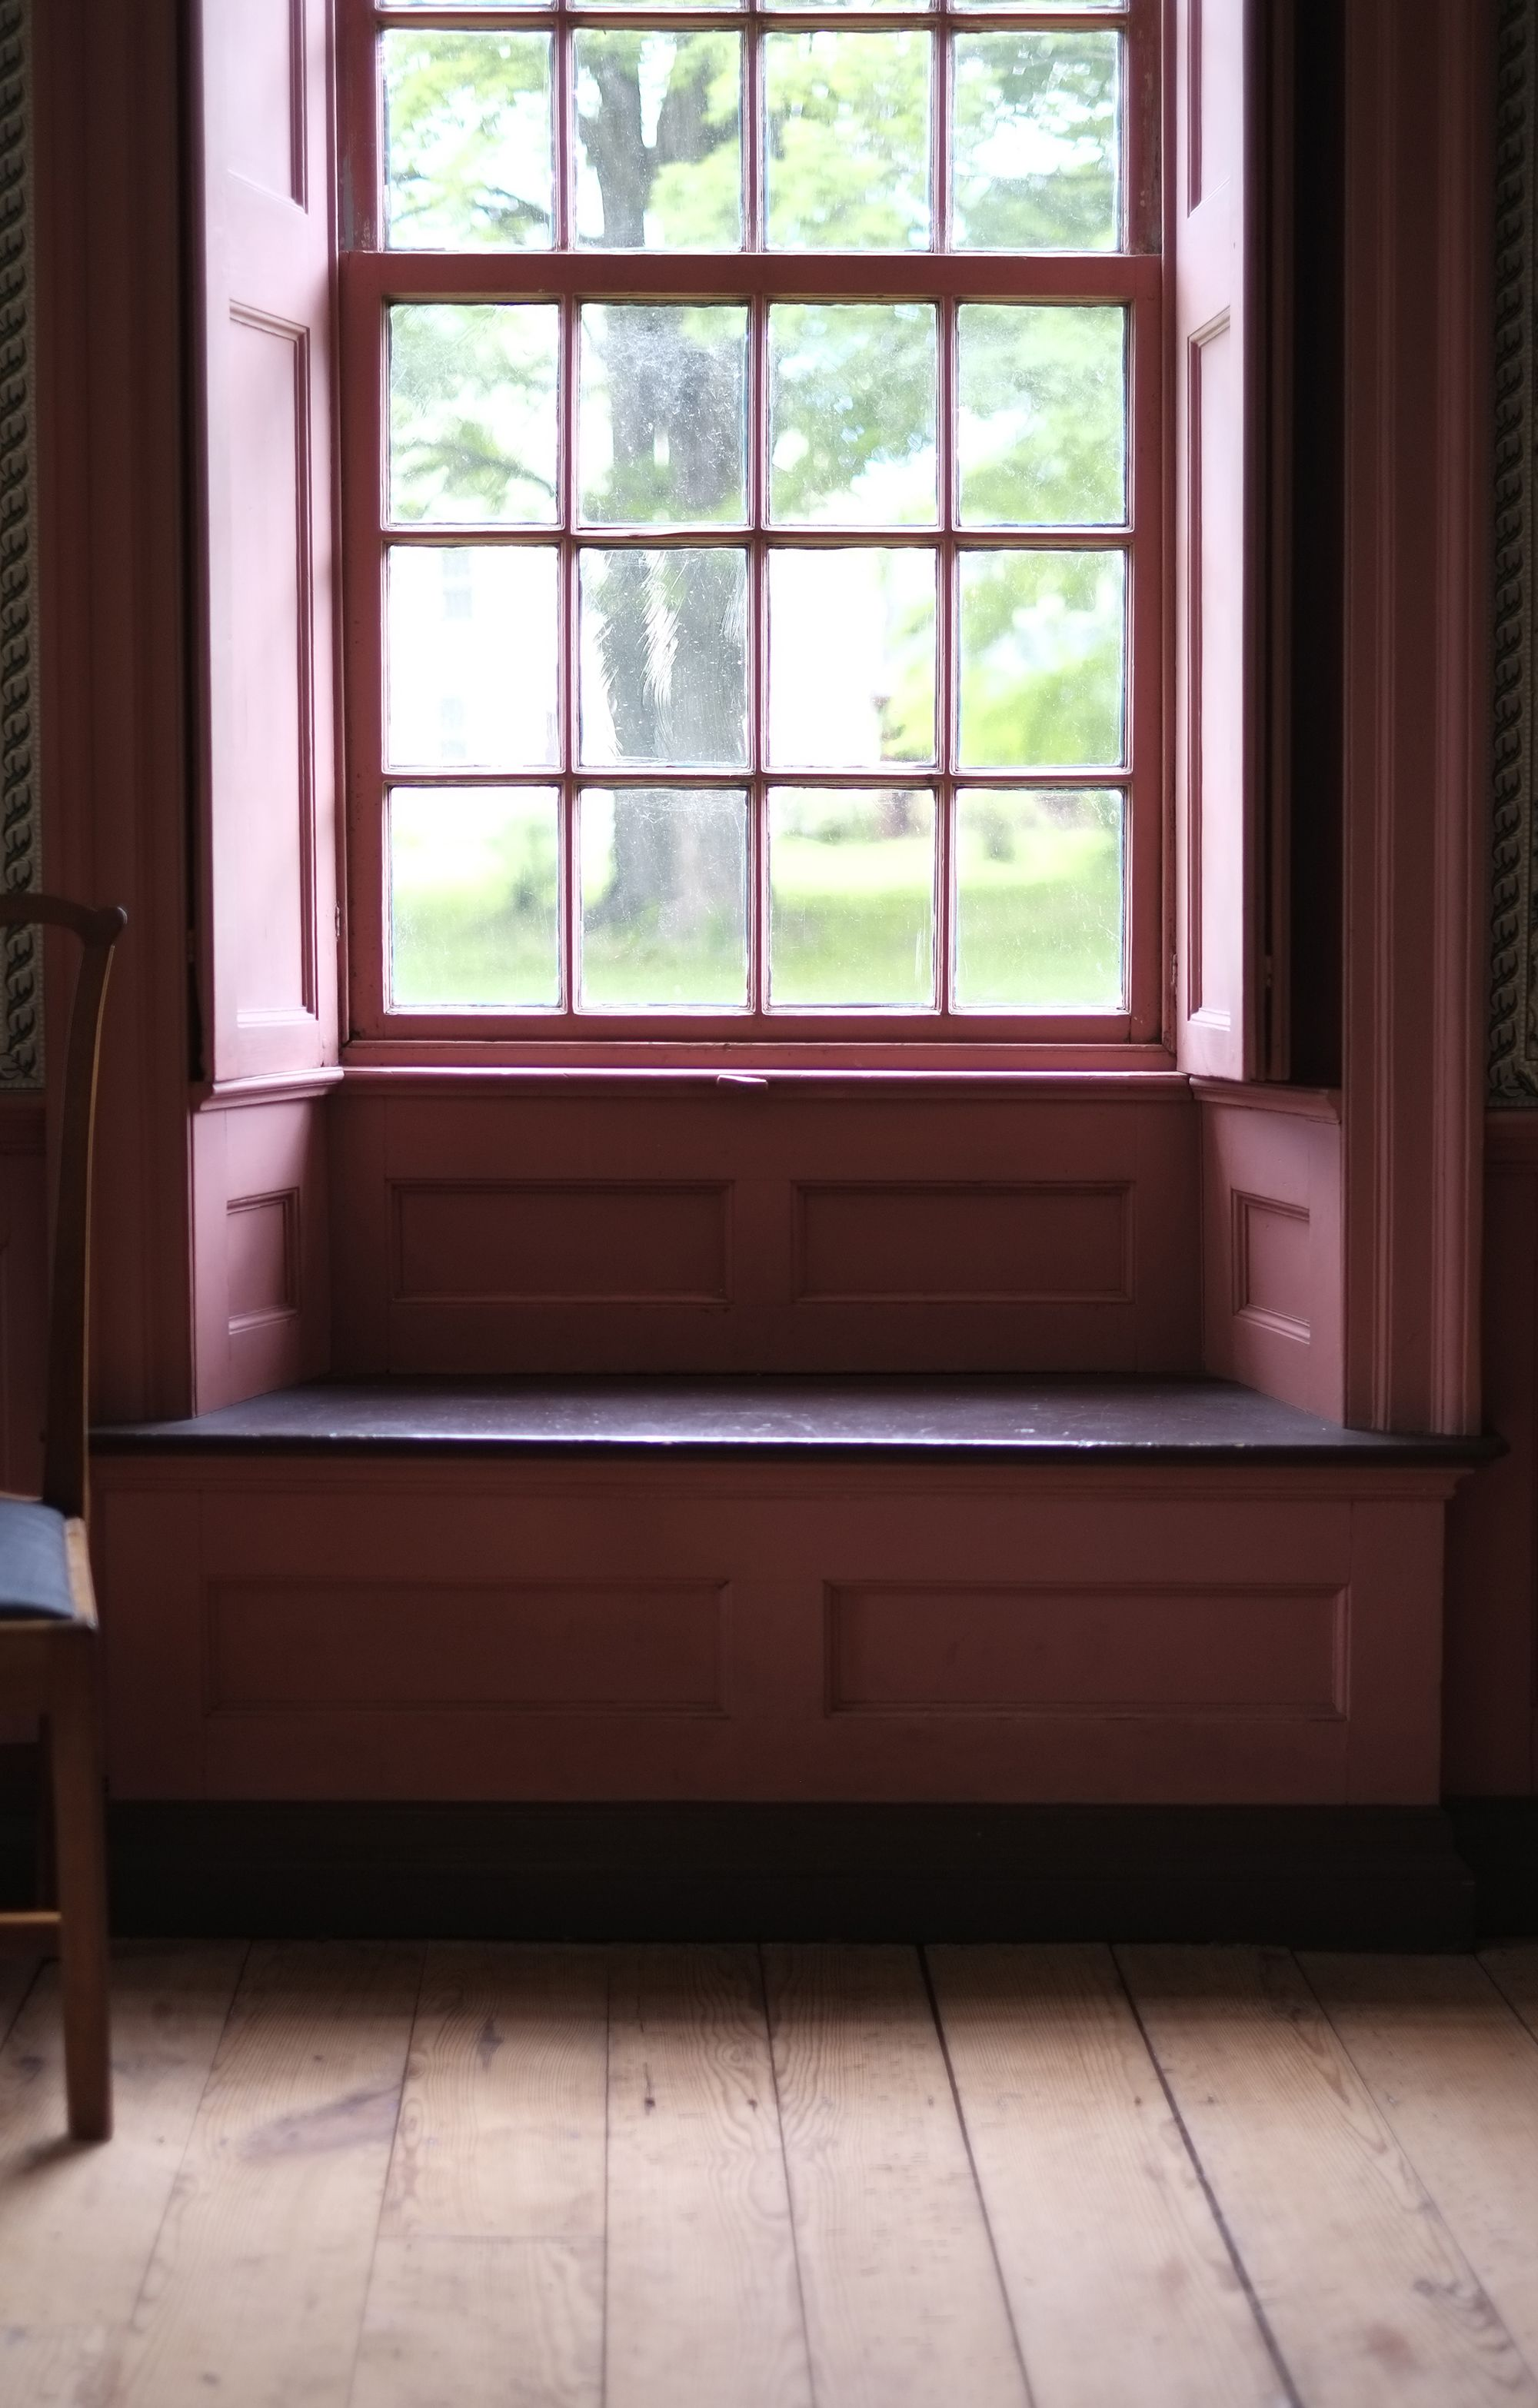 Window Seat Library: Scenes From Historic Deerfield In Deerfield, MA